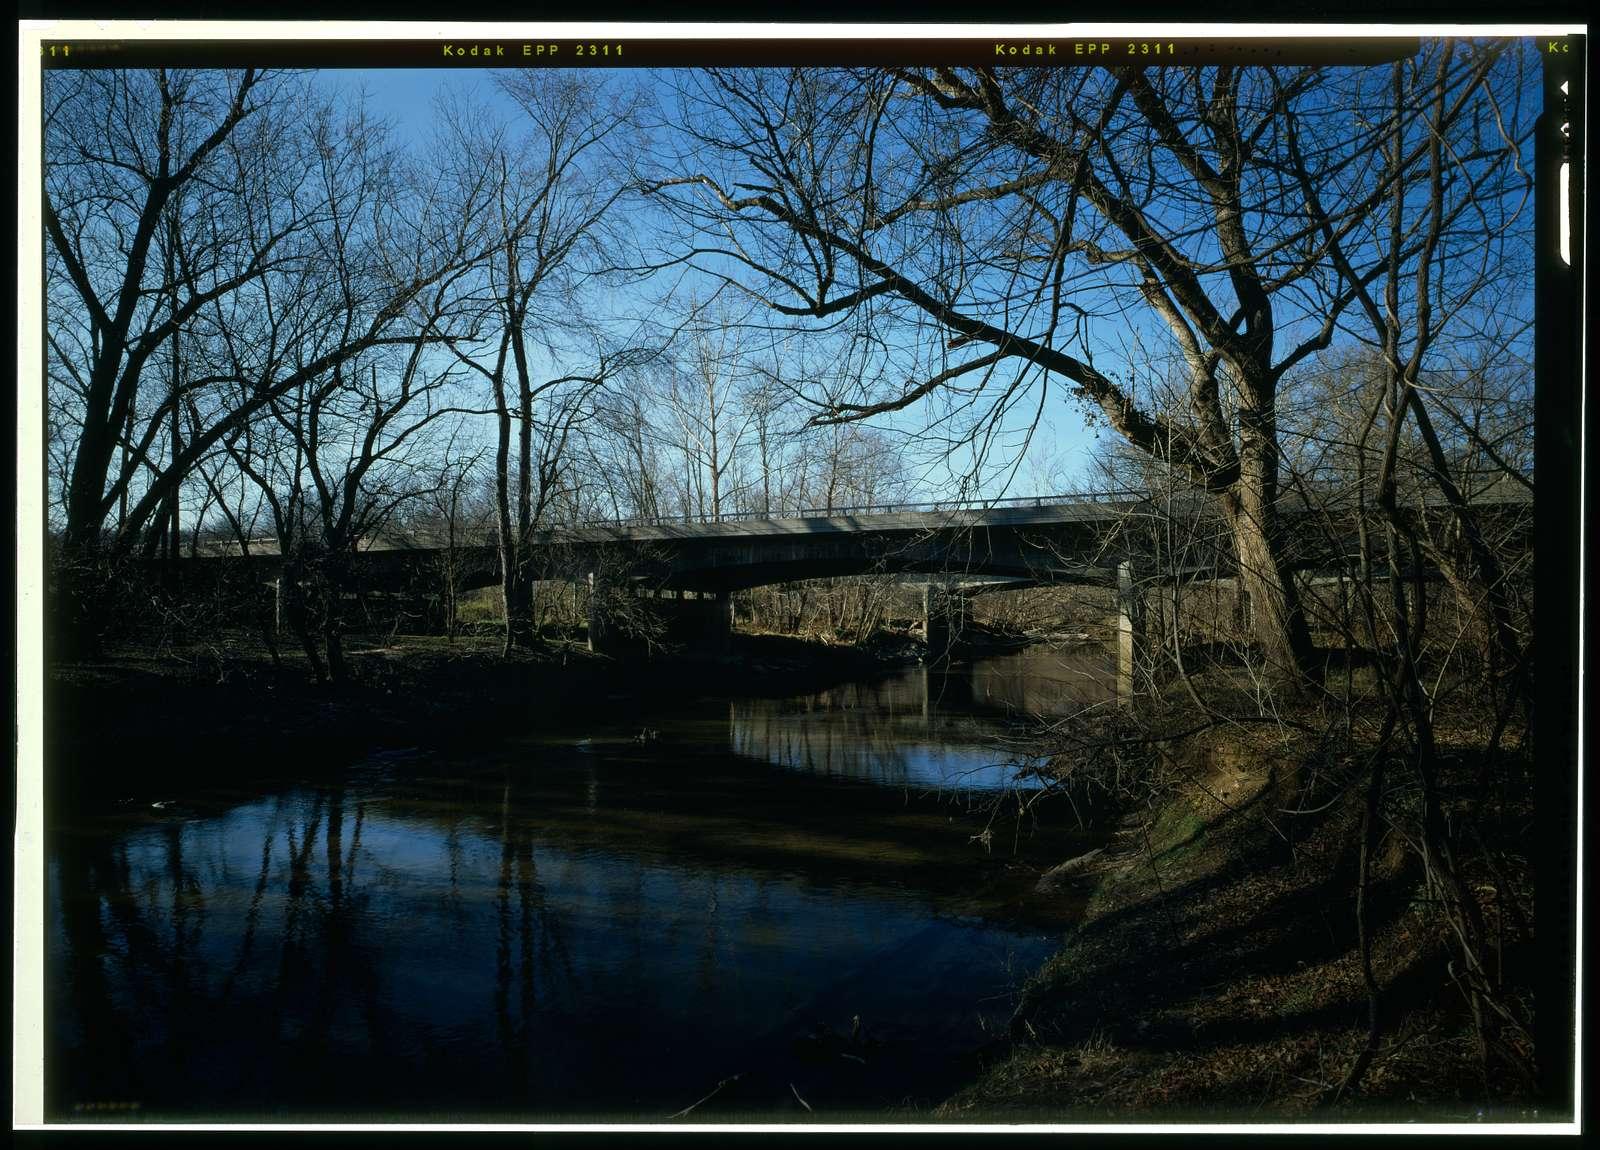 Baltimore-Washington Parkway, Greenbelt, Prince George's County, MD